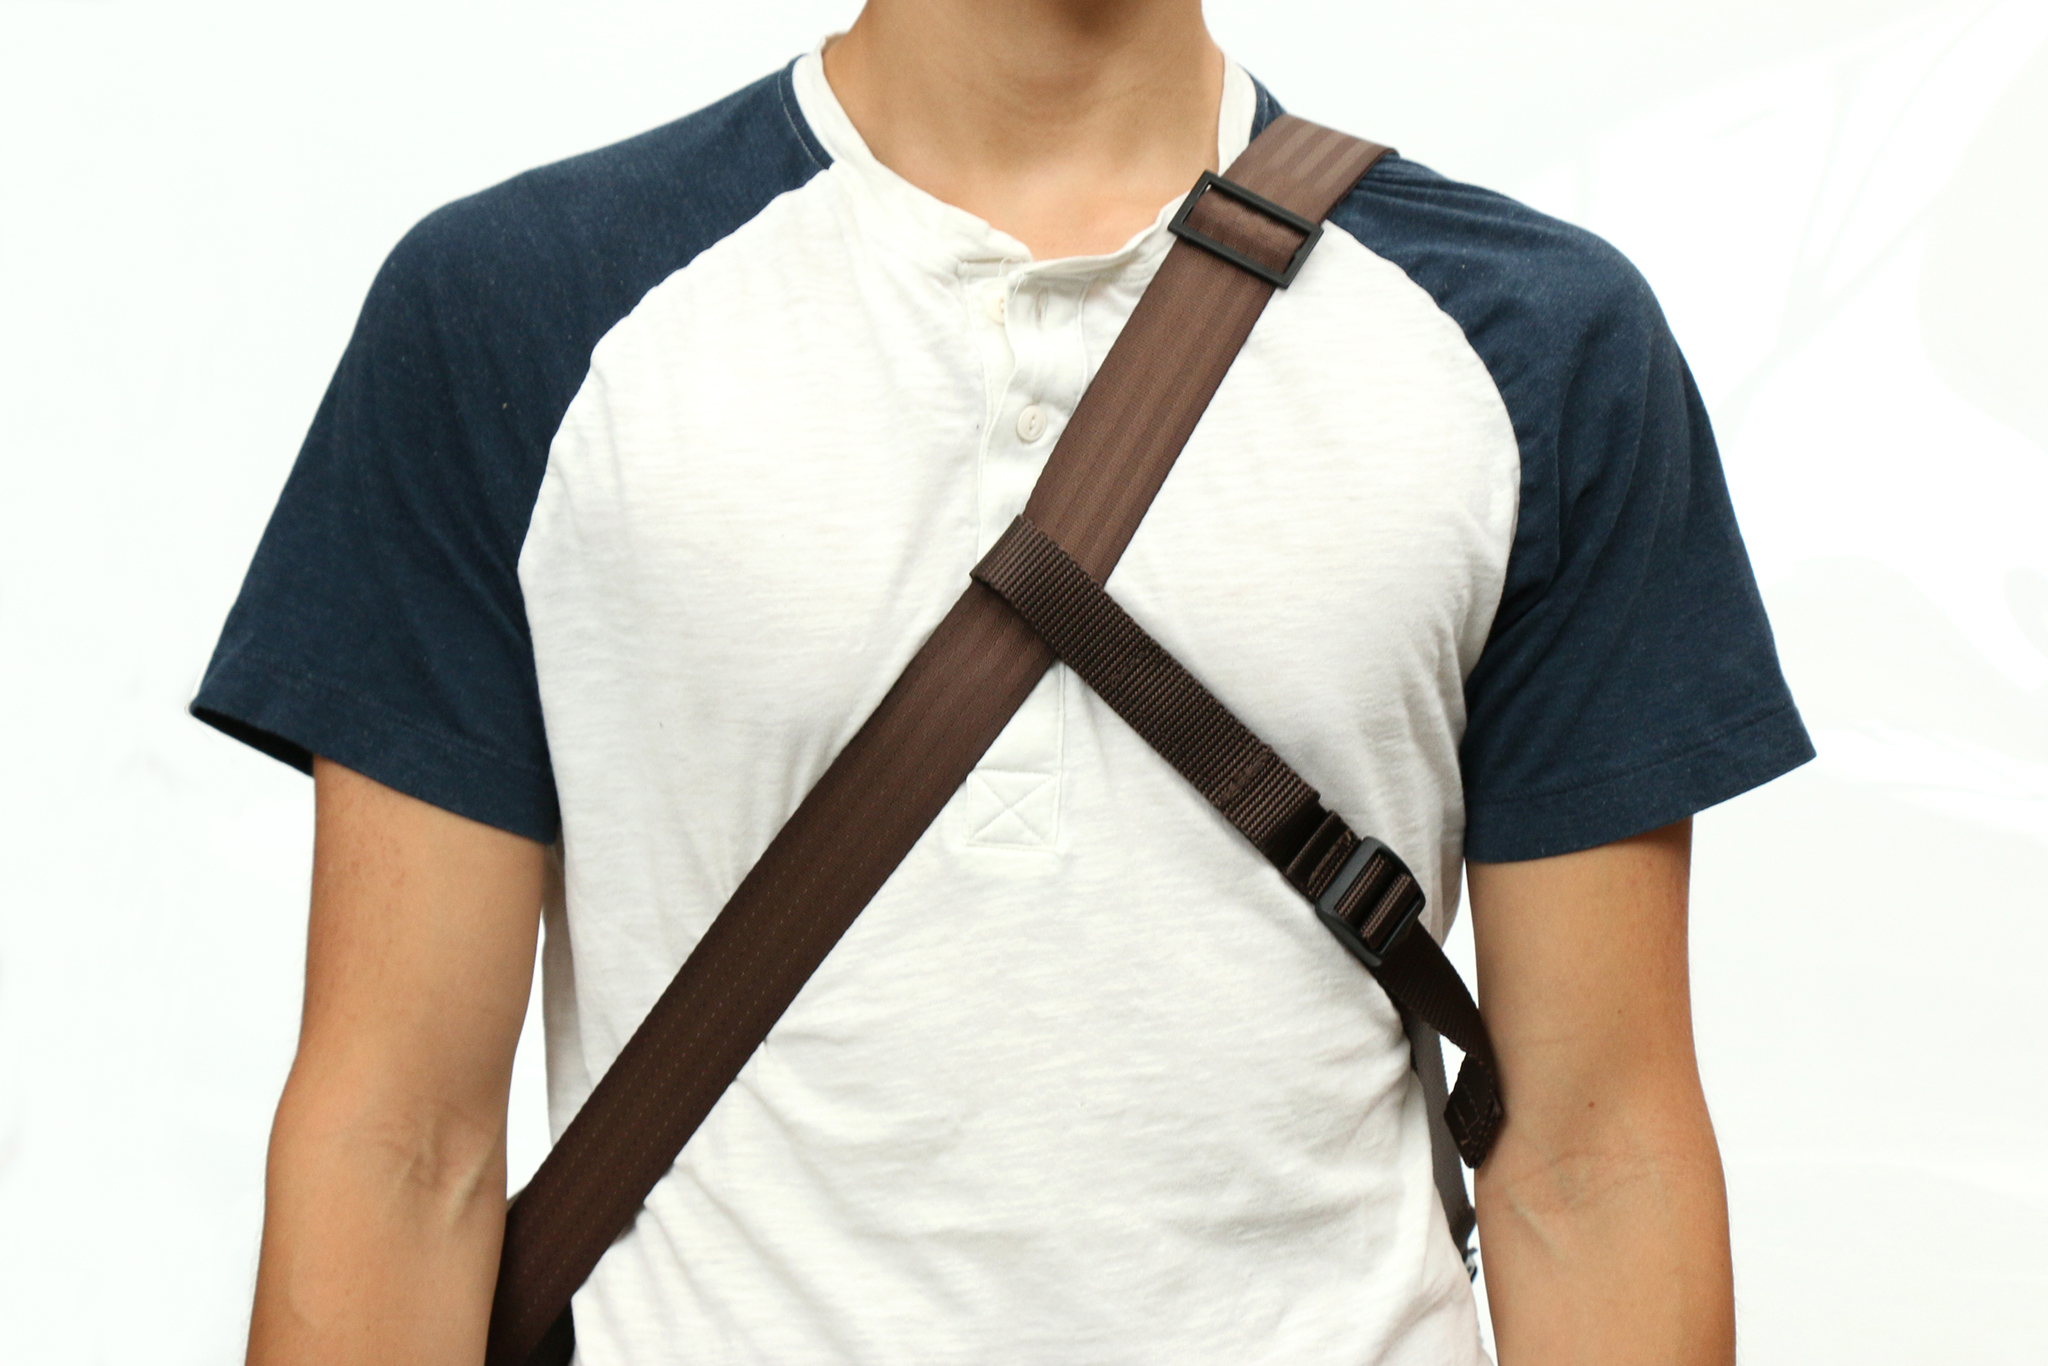 Vitesse-Messenger-cycling-strap